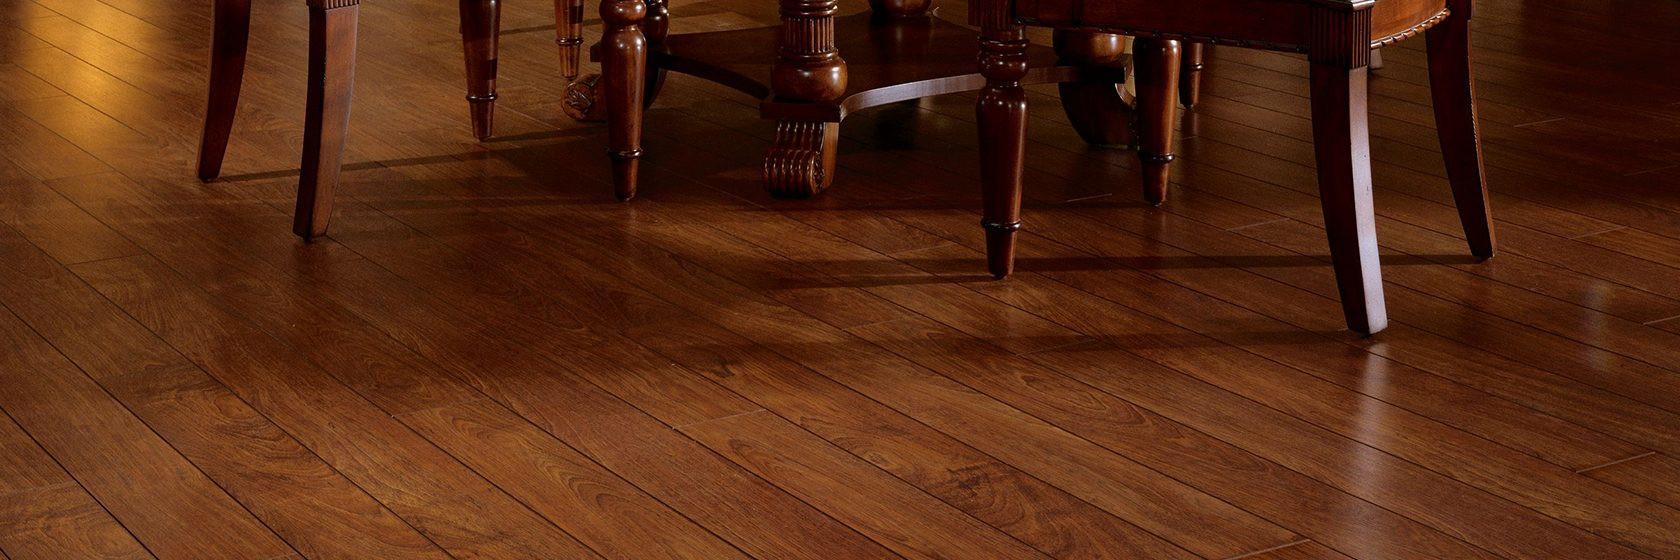 bruce hardwood flooring website of laminate exotic olive ash l8708 pertaining to hero l 1680 560